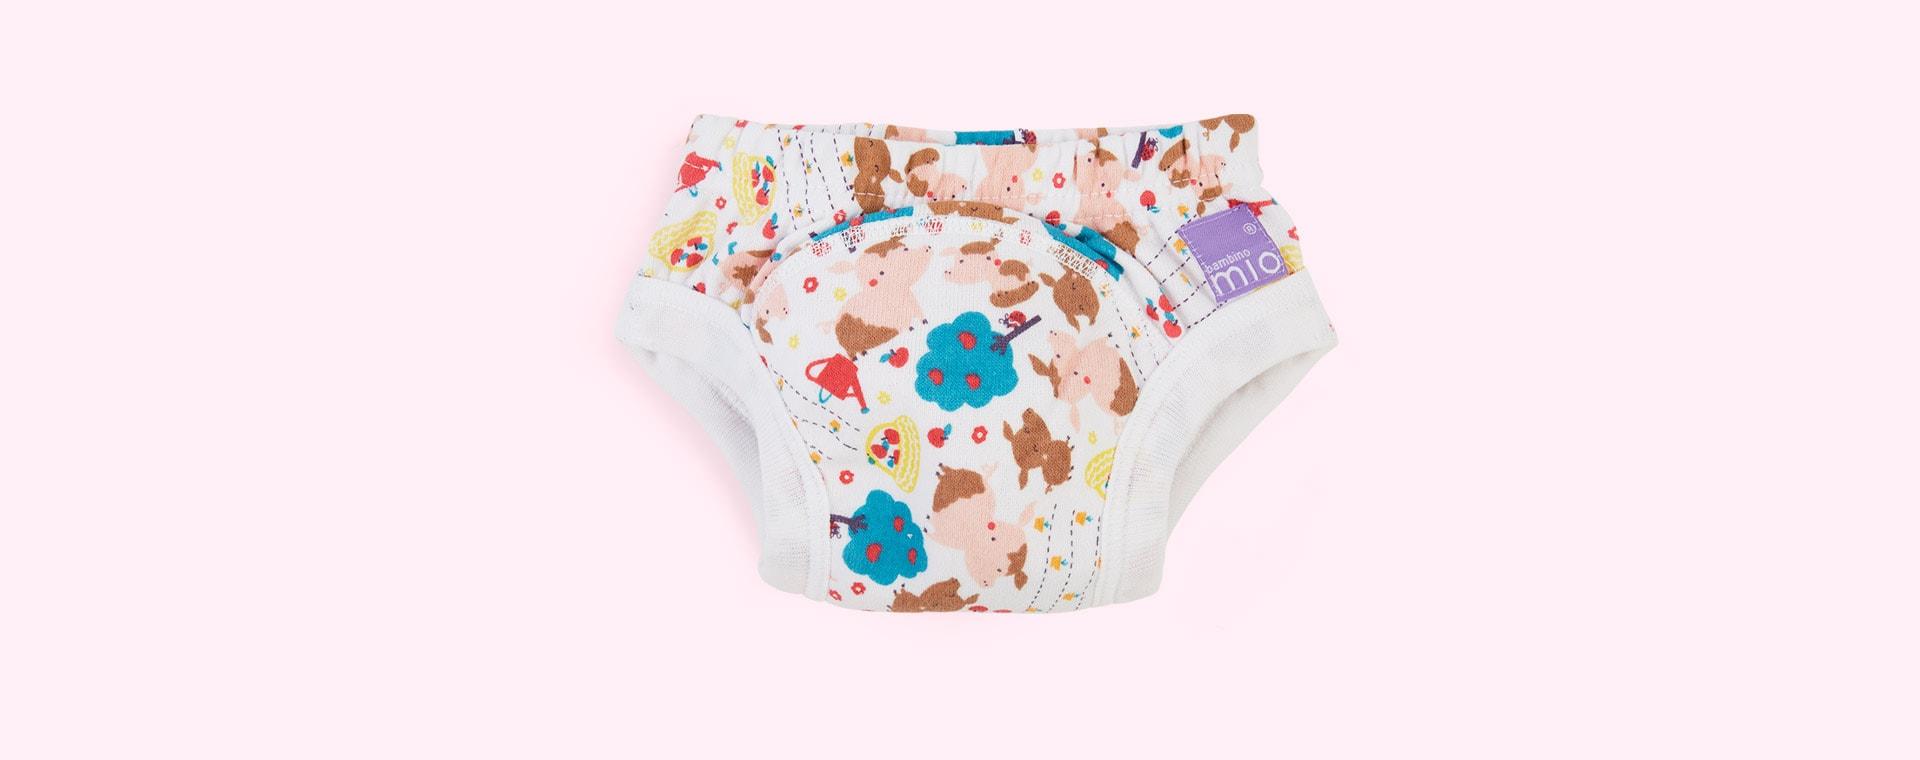 Puddle Pigs Bambino Mio Potty Training Pant